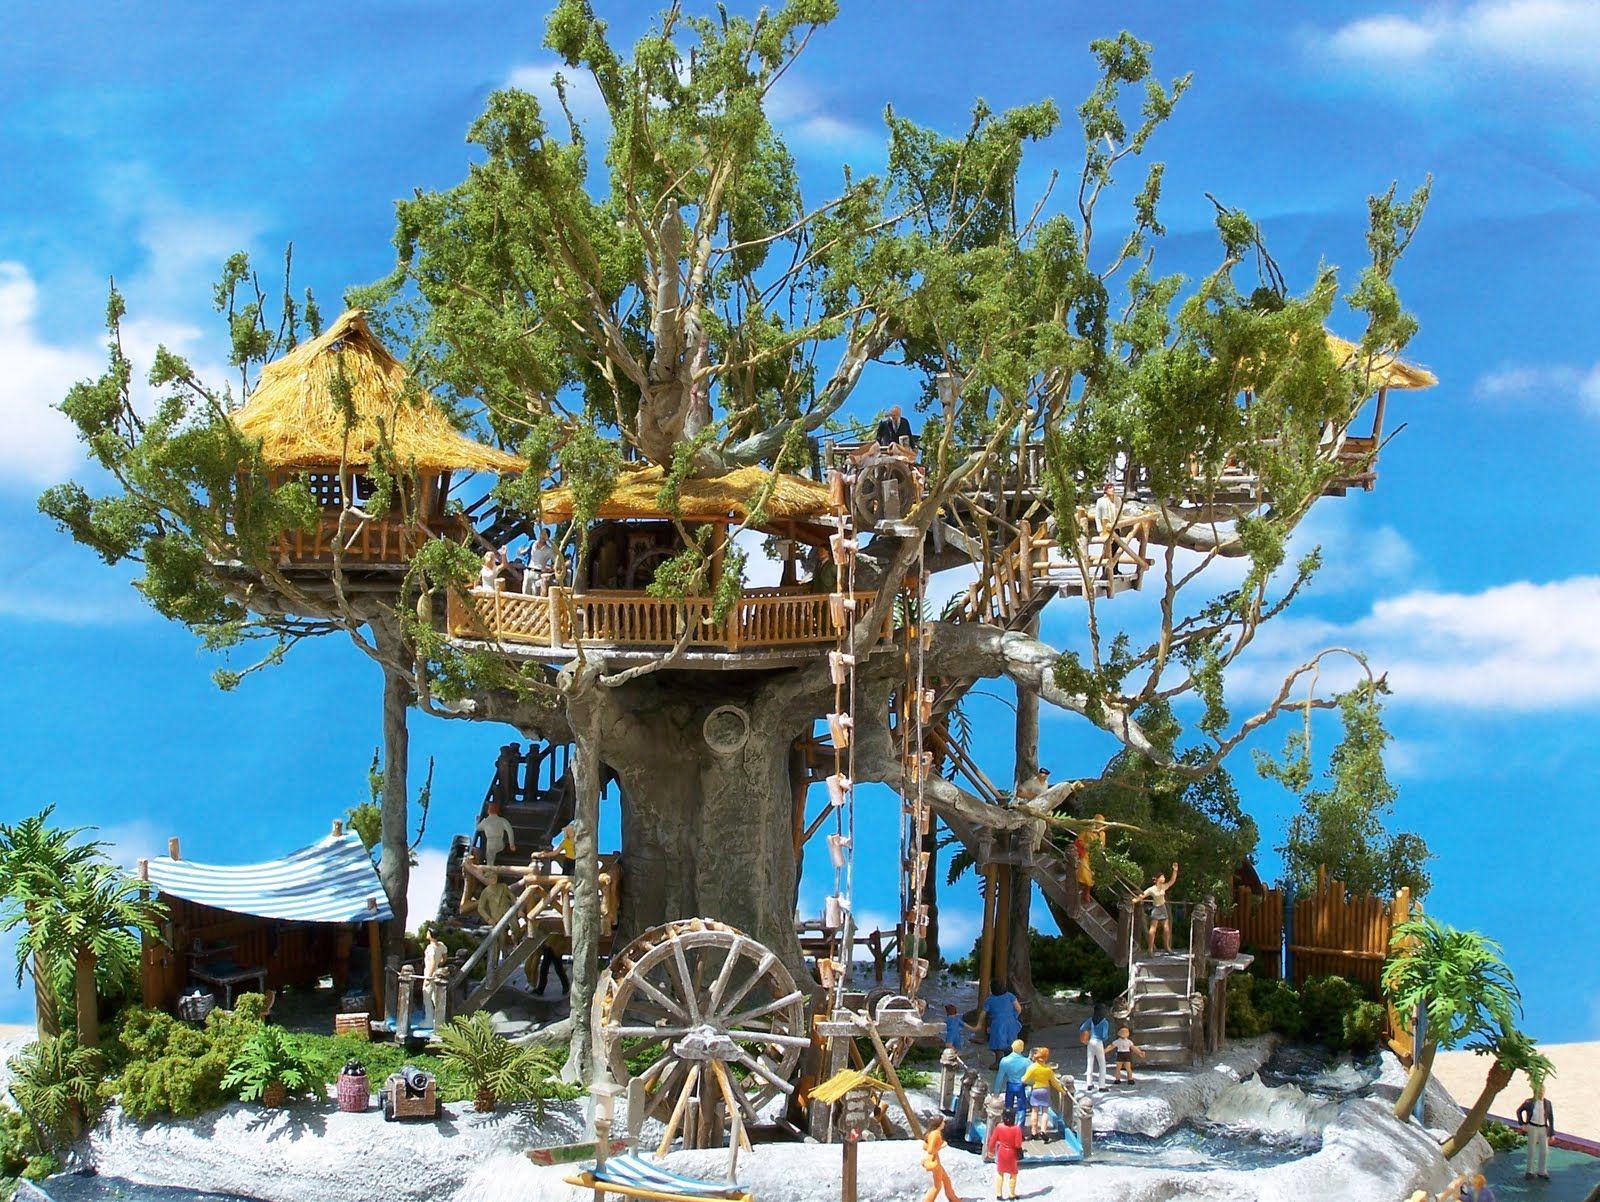 Swiss Family Robinson Treehouse Model Disneyland C